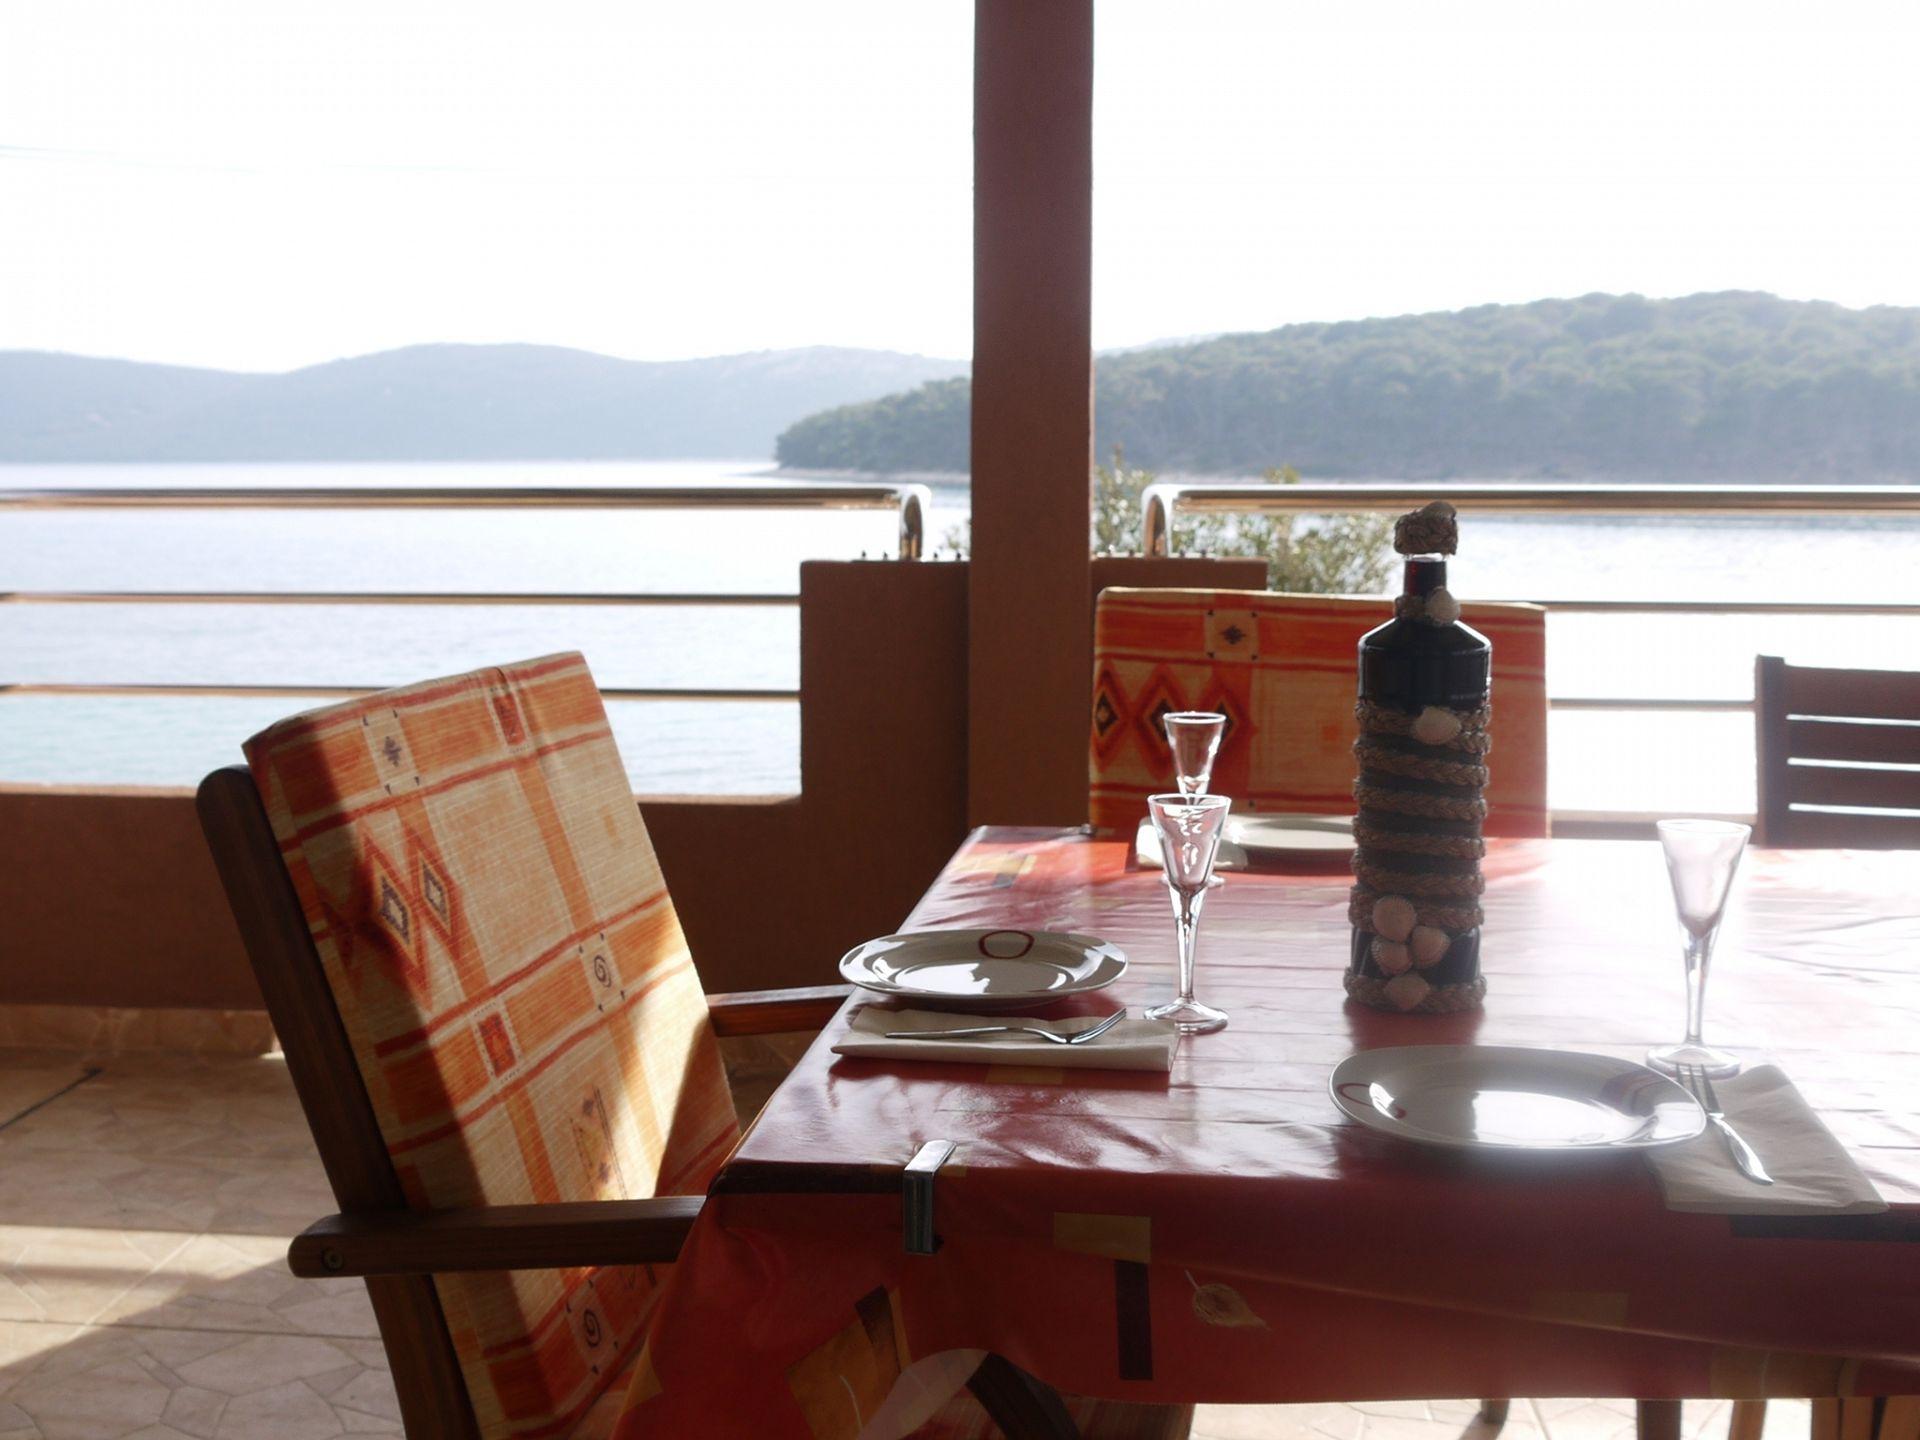 Ado - Molat (Eiland Molat) - Vakantiehuizen, villa´s Kroatië